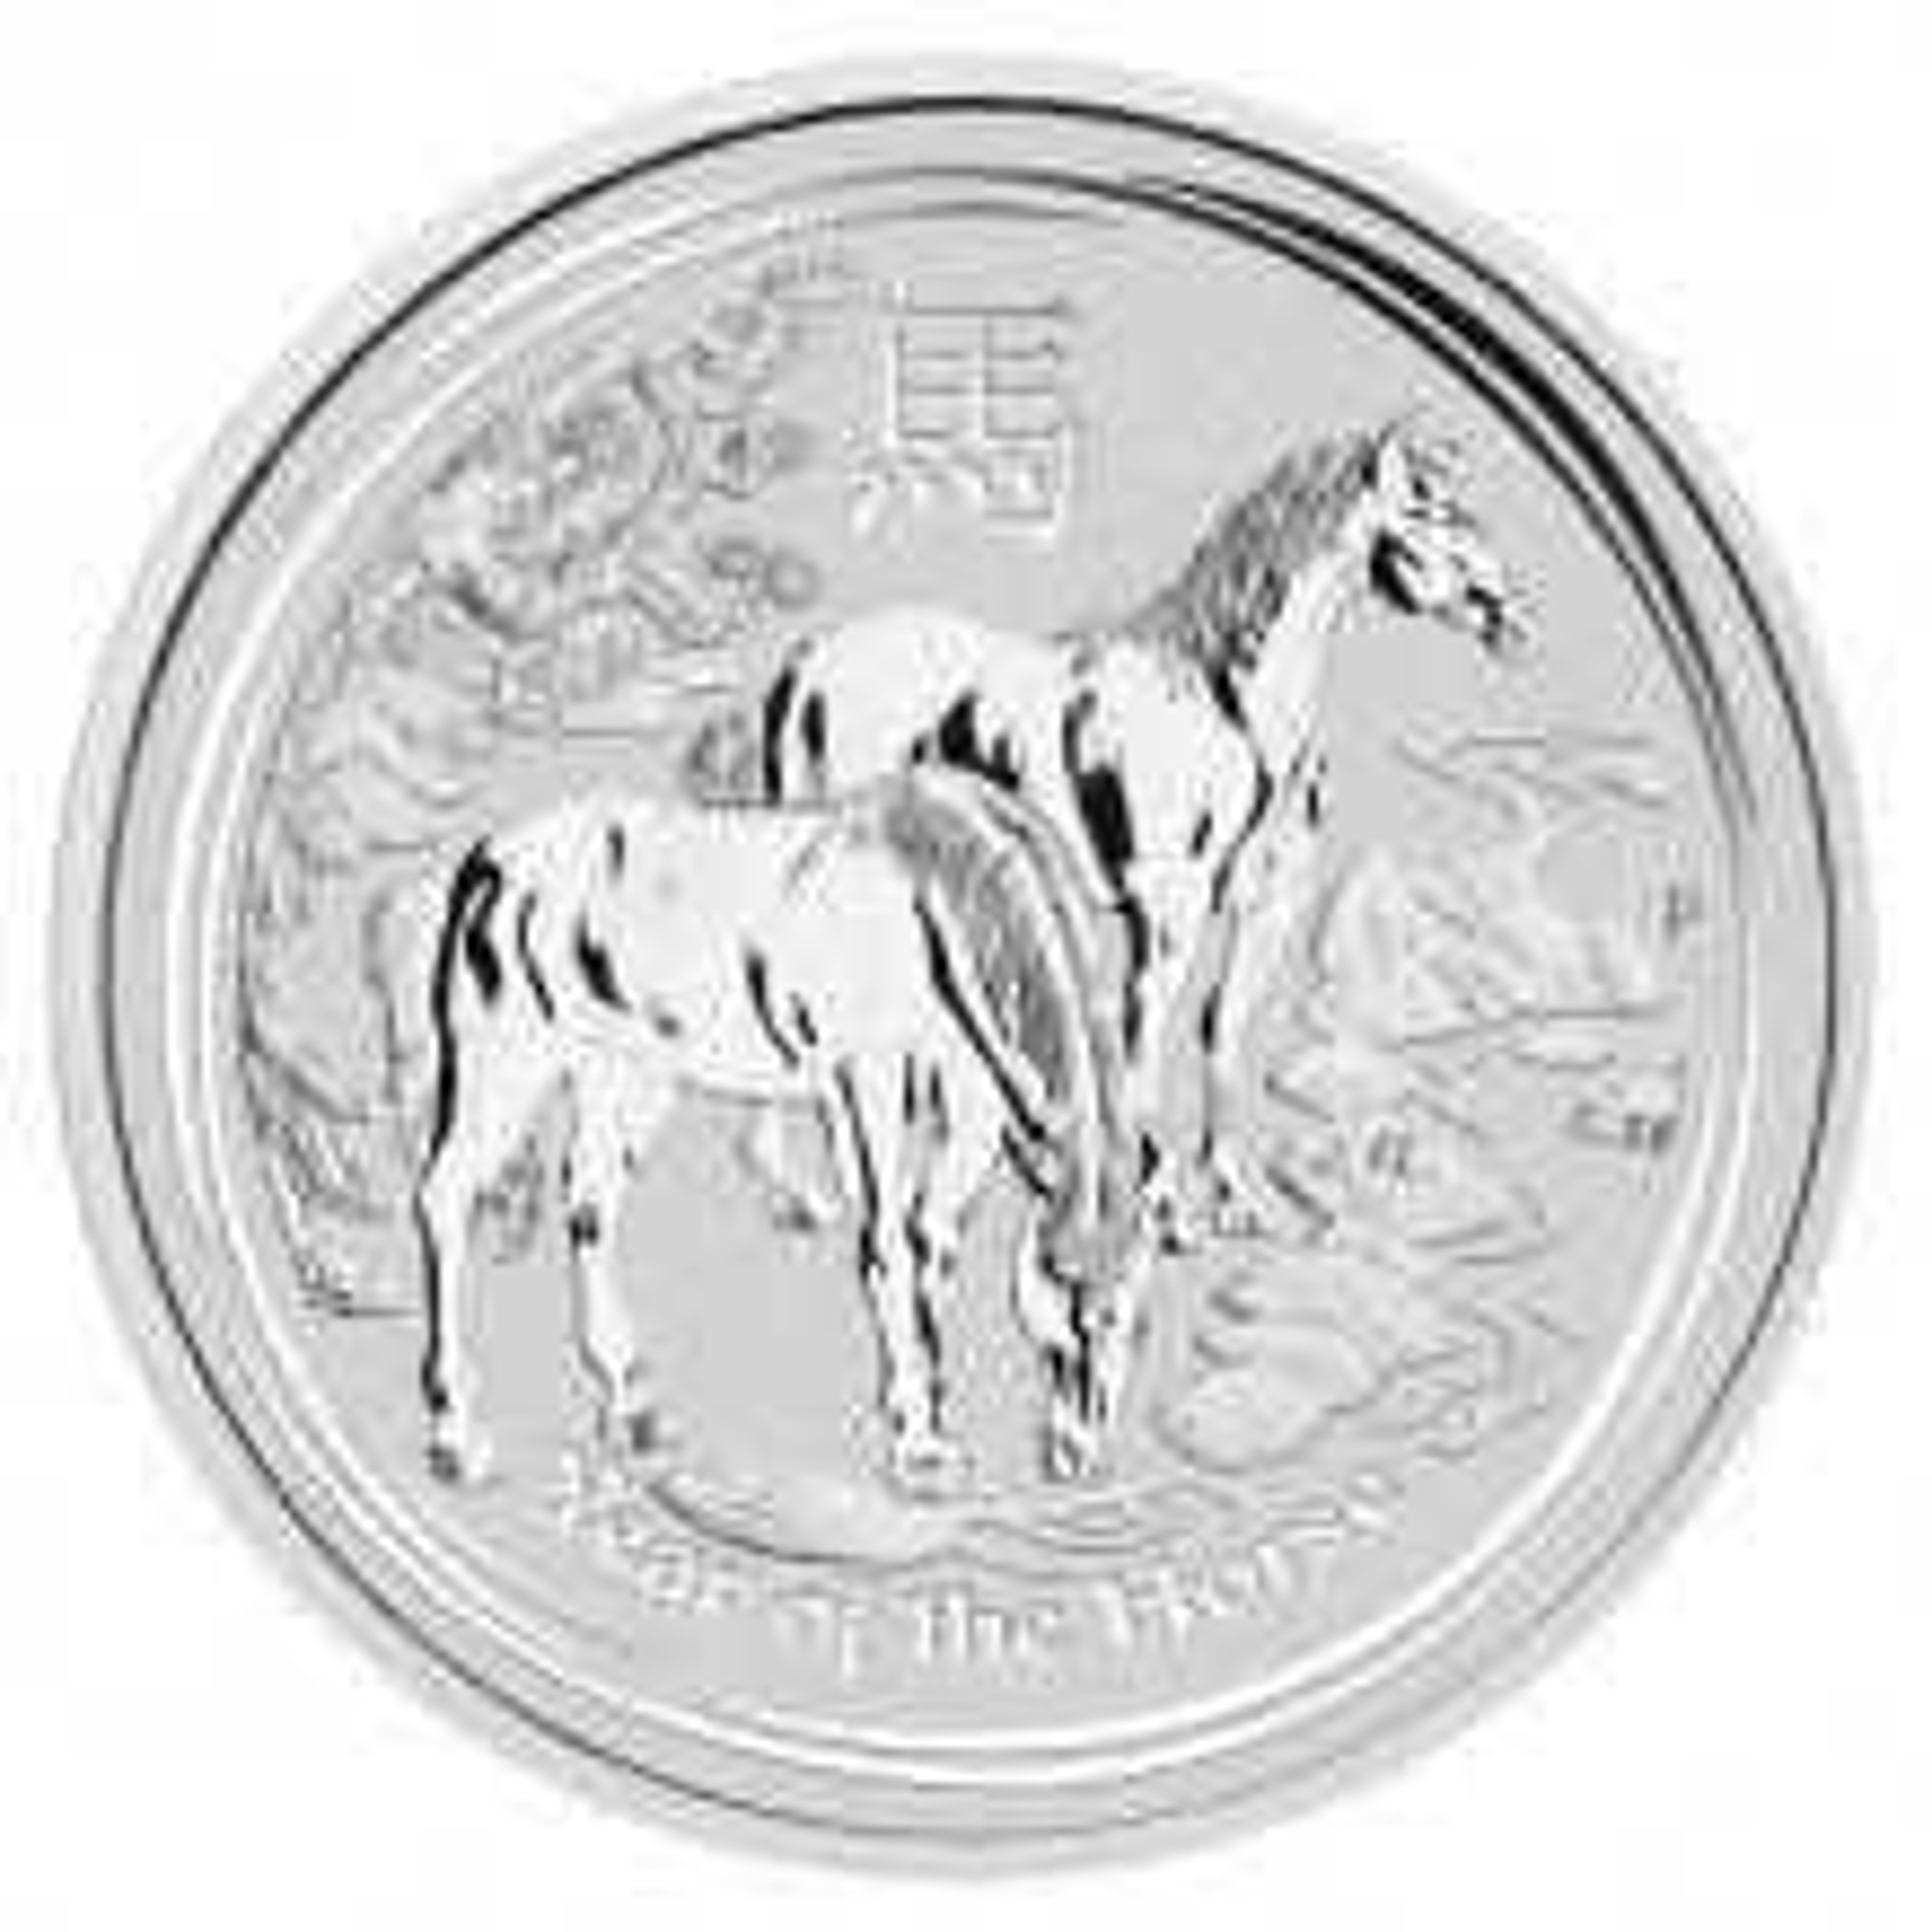 1 kilo Lunar silver coin 2014